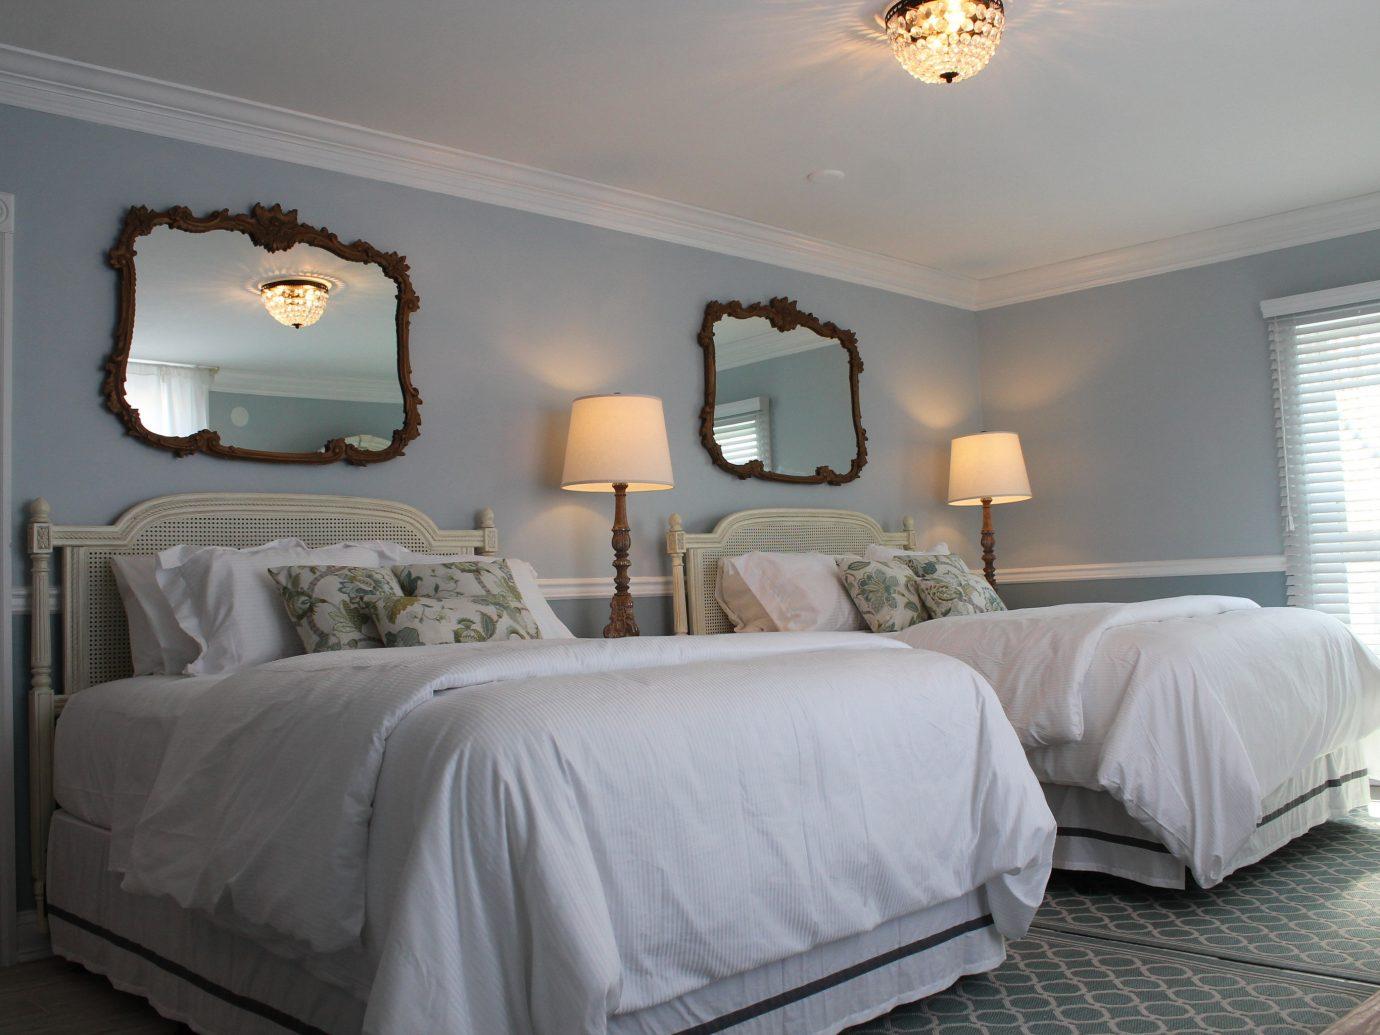 Romance Trip Ideas Weekend Getaways bed wall indoor Bedroom hotel floor room ceiling home bed frame interior design real estate window furniture bed sheet bedding mattress house